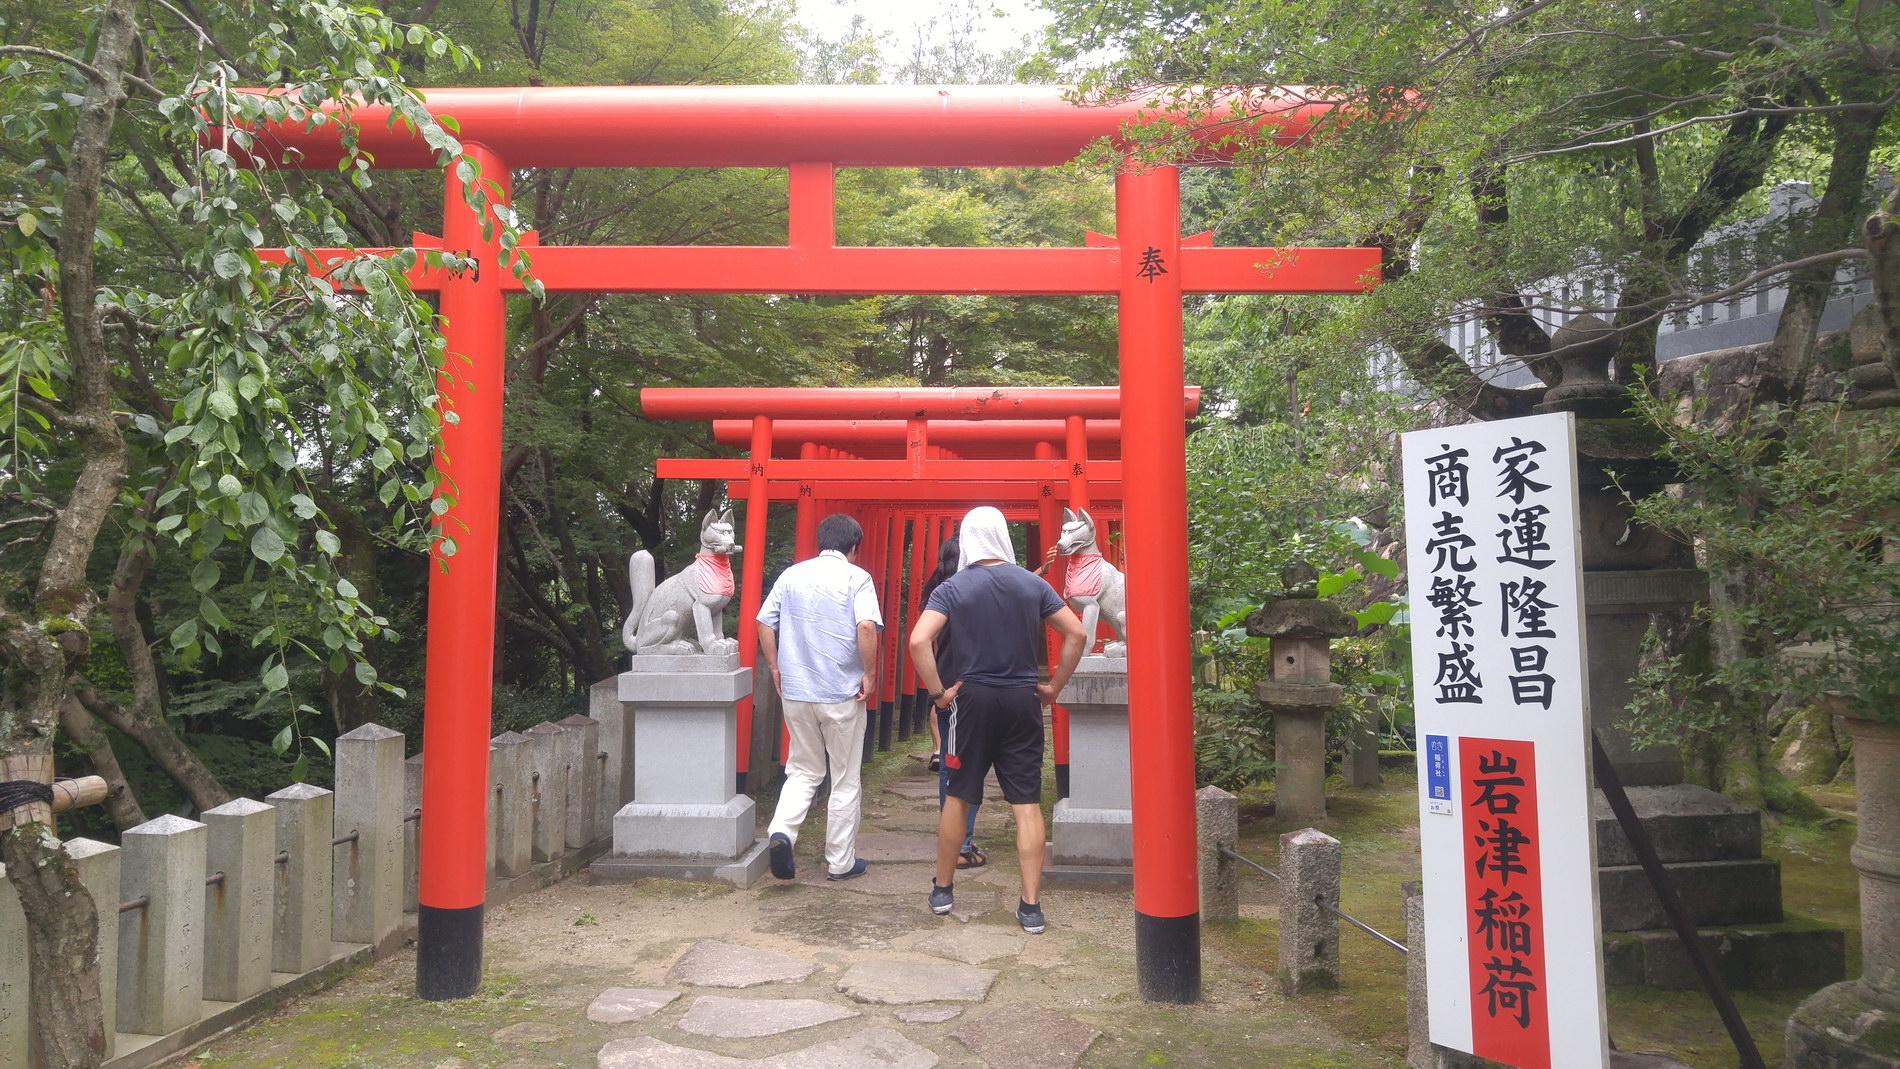 Field trip to local shrine with Yamaguchi sensei